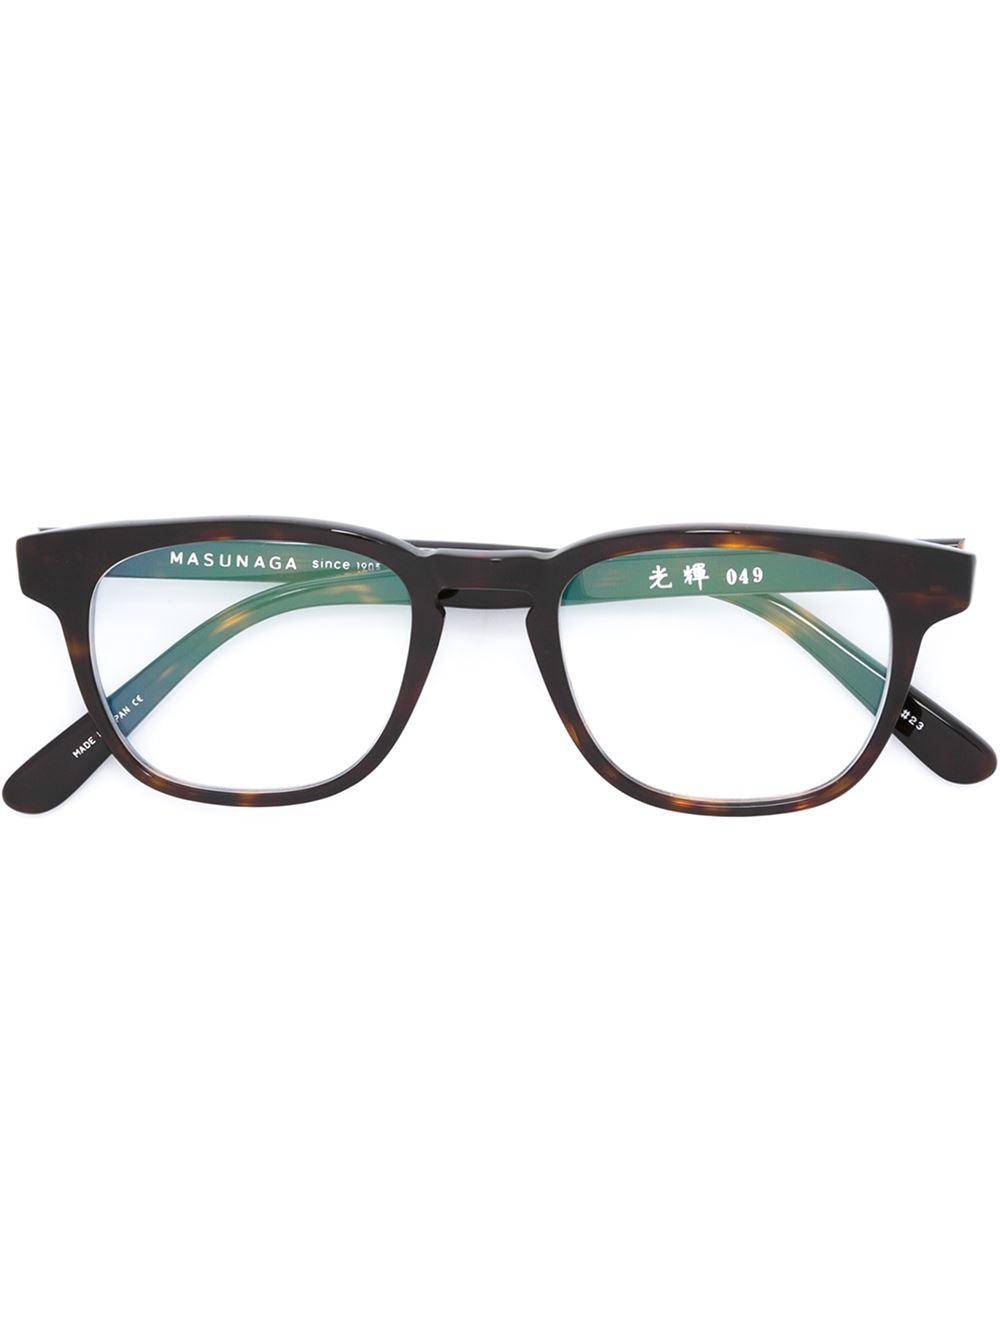 e14273f50db Lyst - Masunaga Rectangular-shaped Glasses in Black for Men